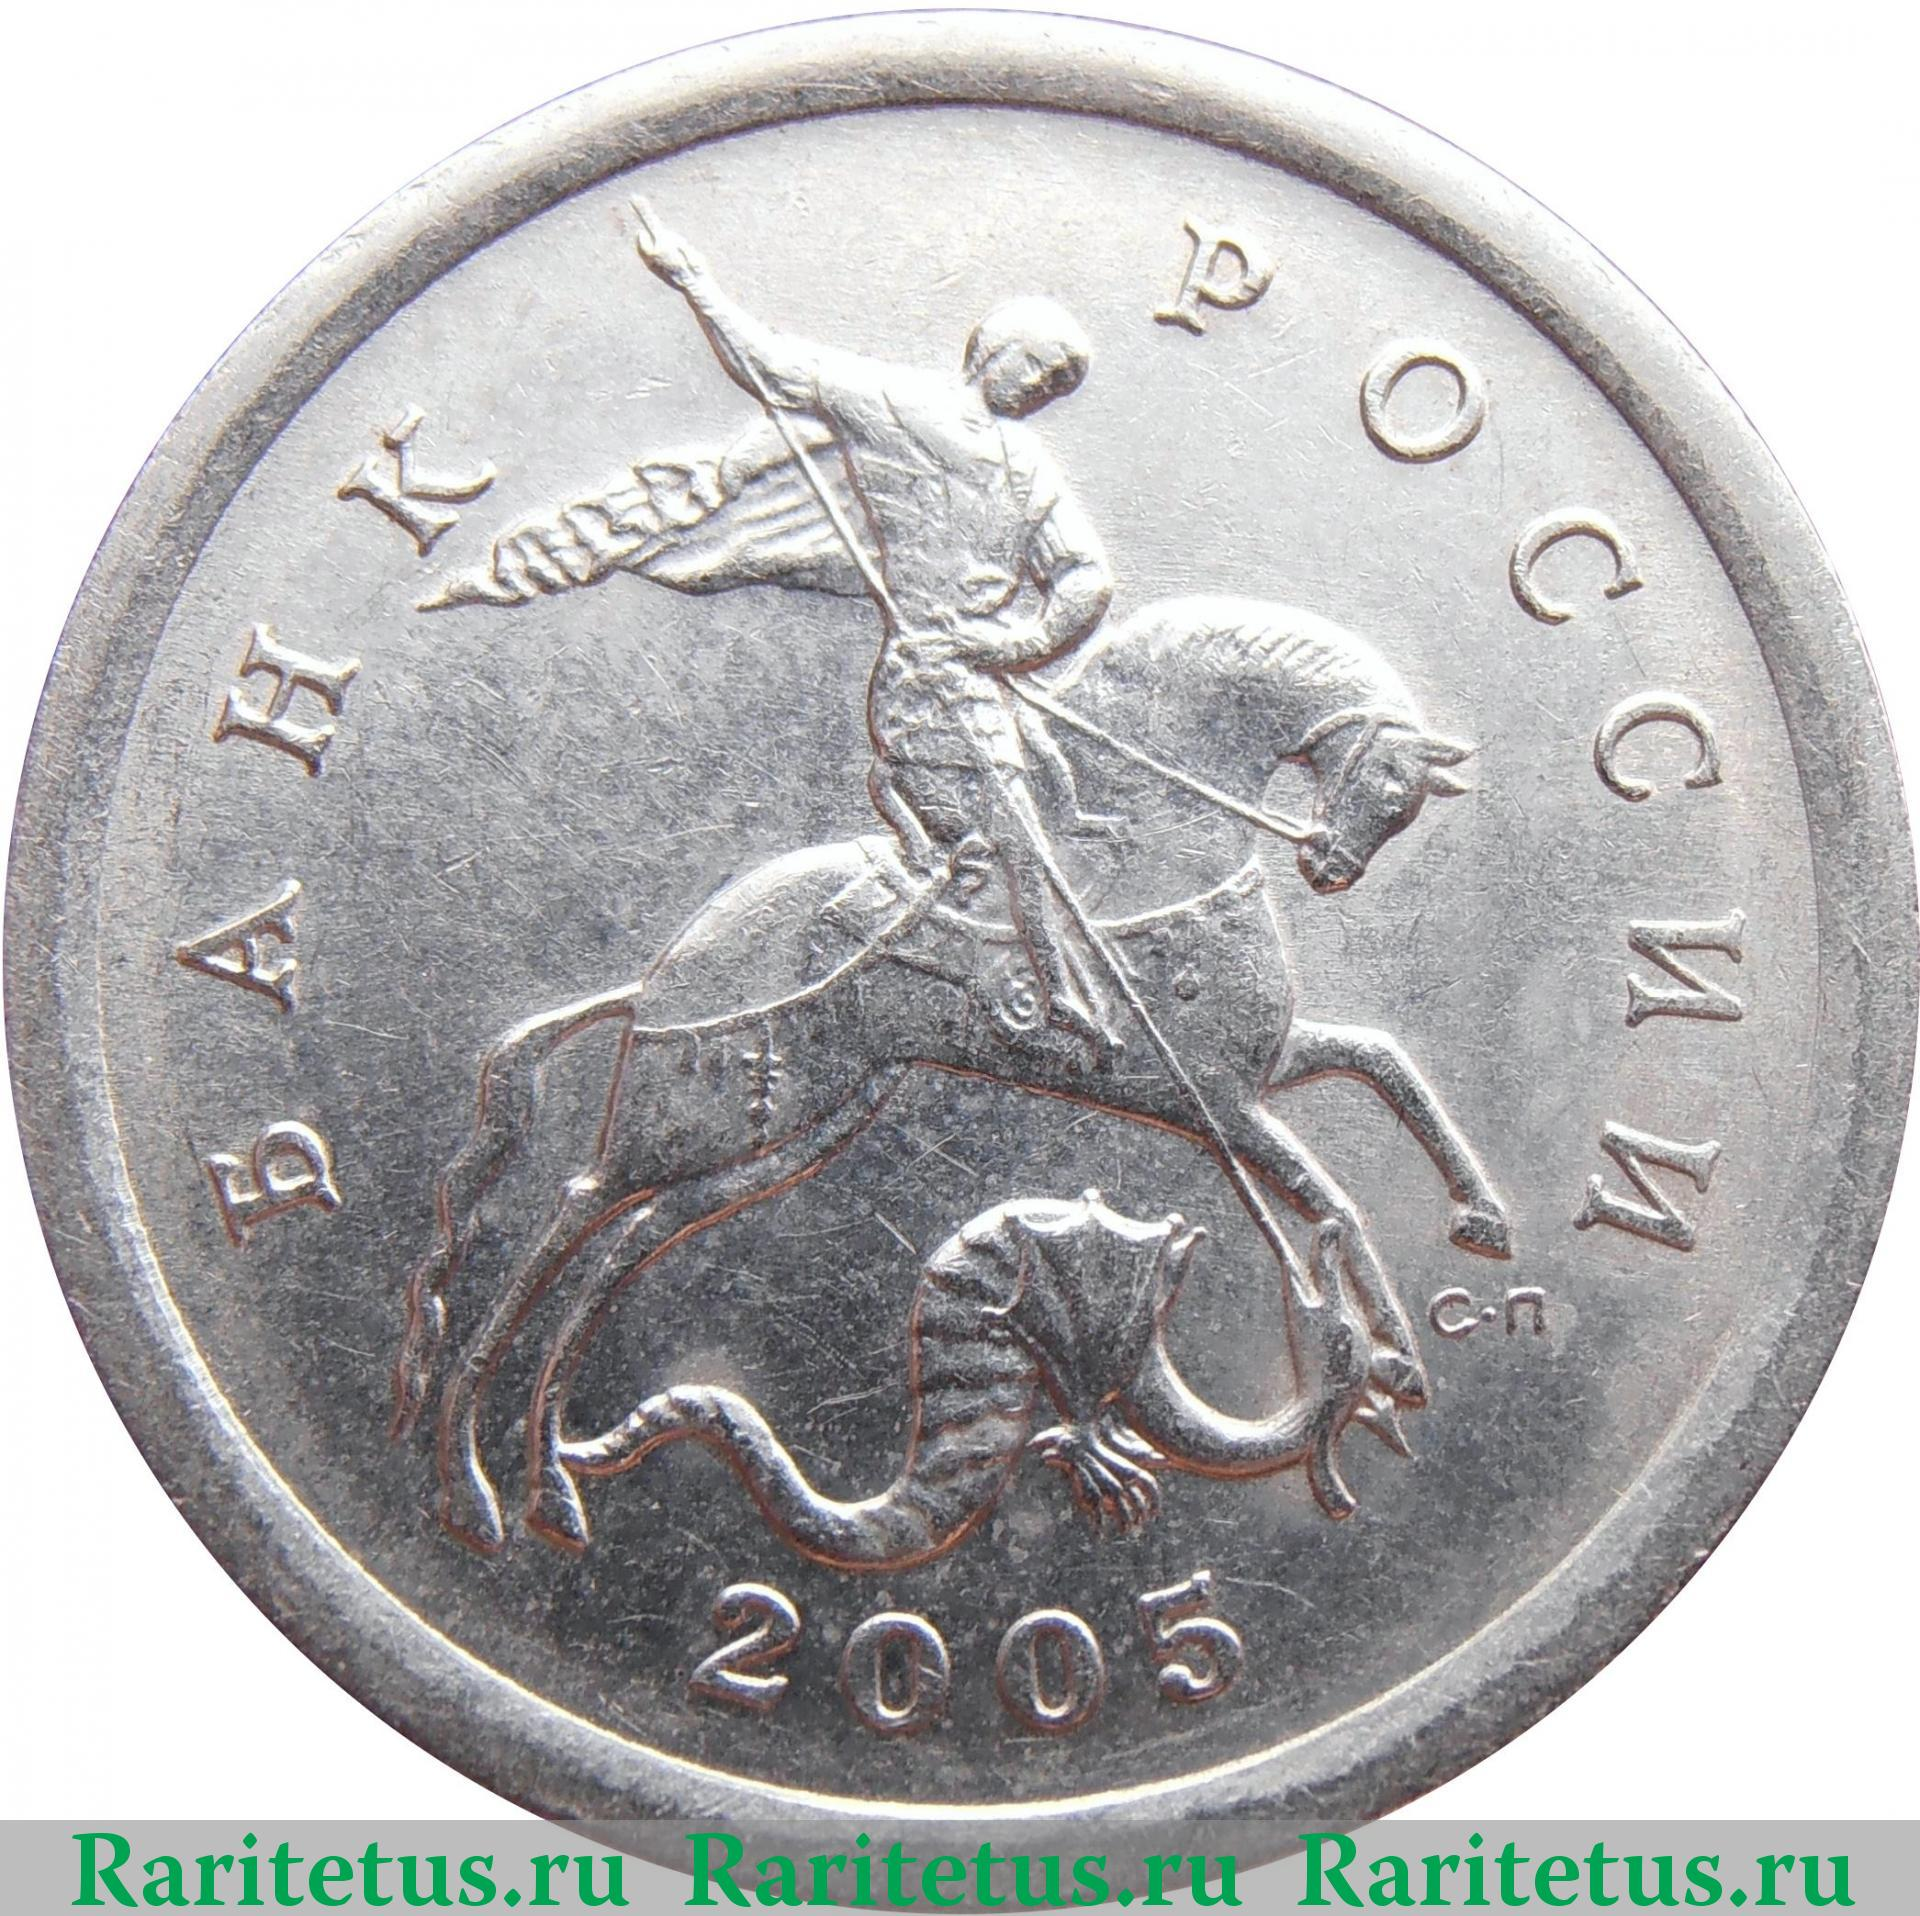 5 копеек 2005 сп мн число штемпель